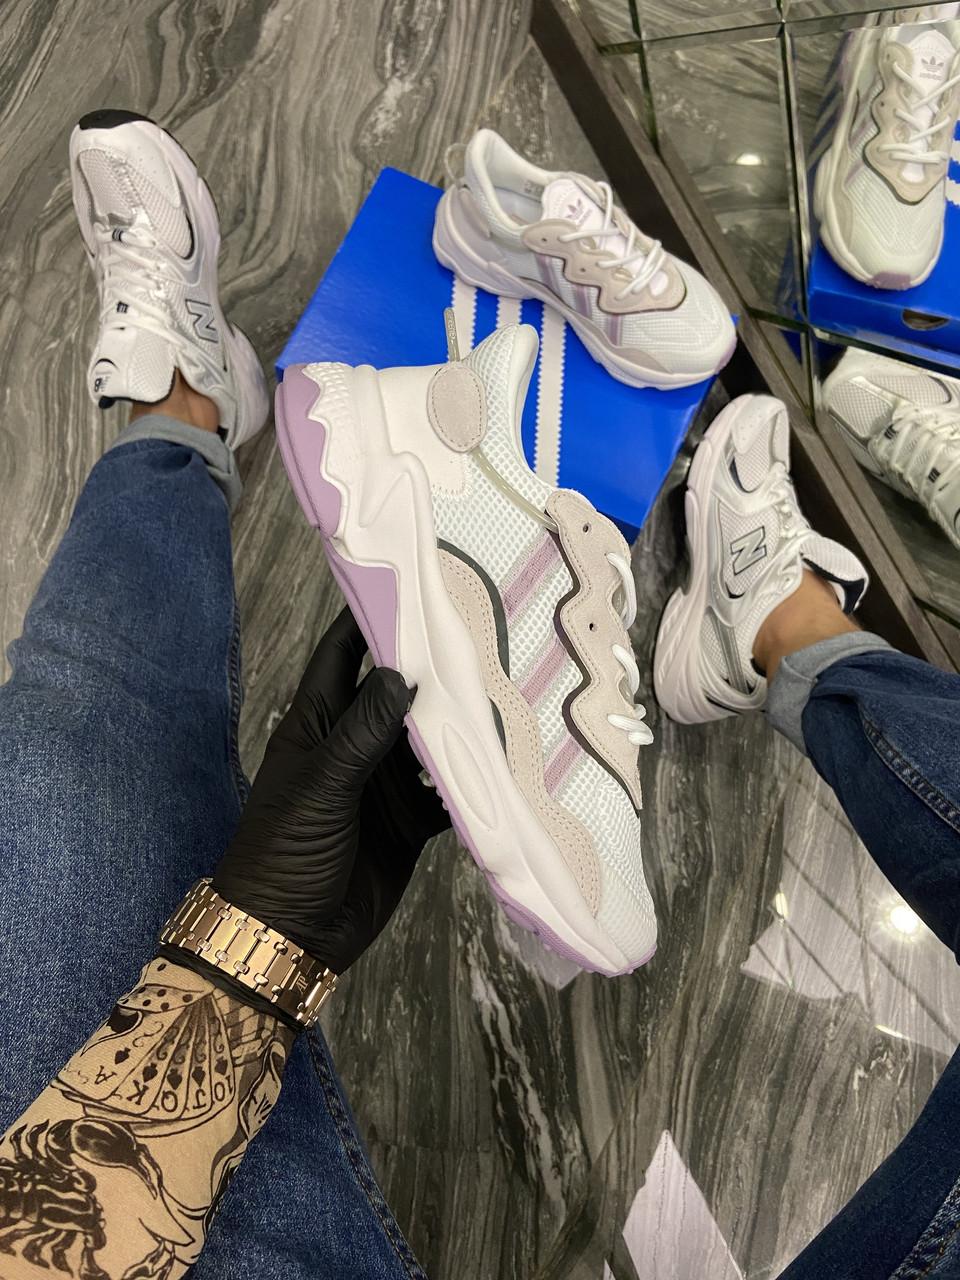 Ad!id@s, крос, обувь, взуття, sneakers, шузы, Ozweego White Violet (Белый)